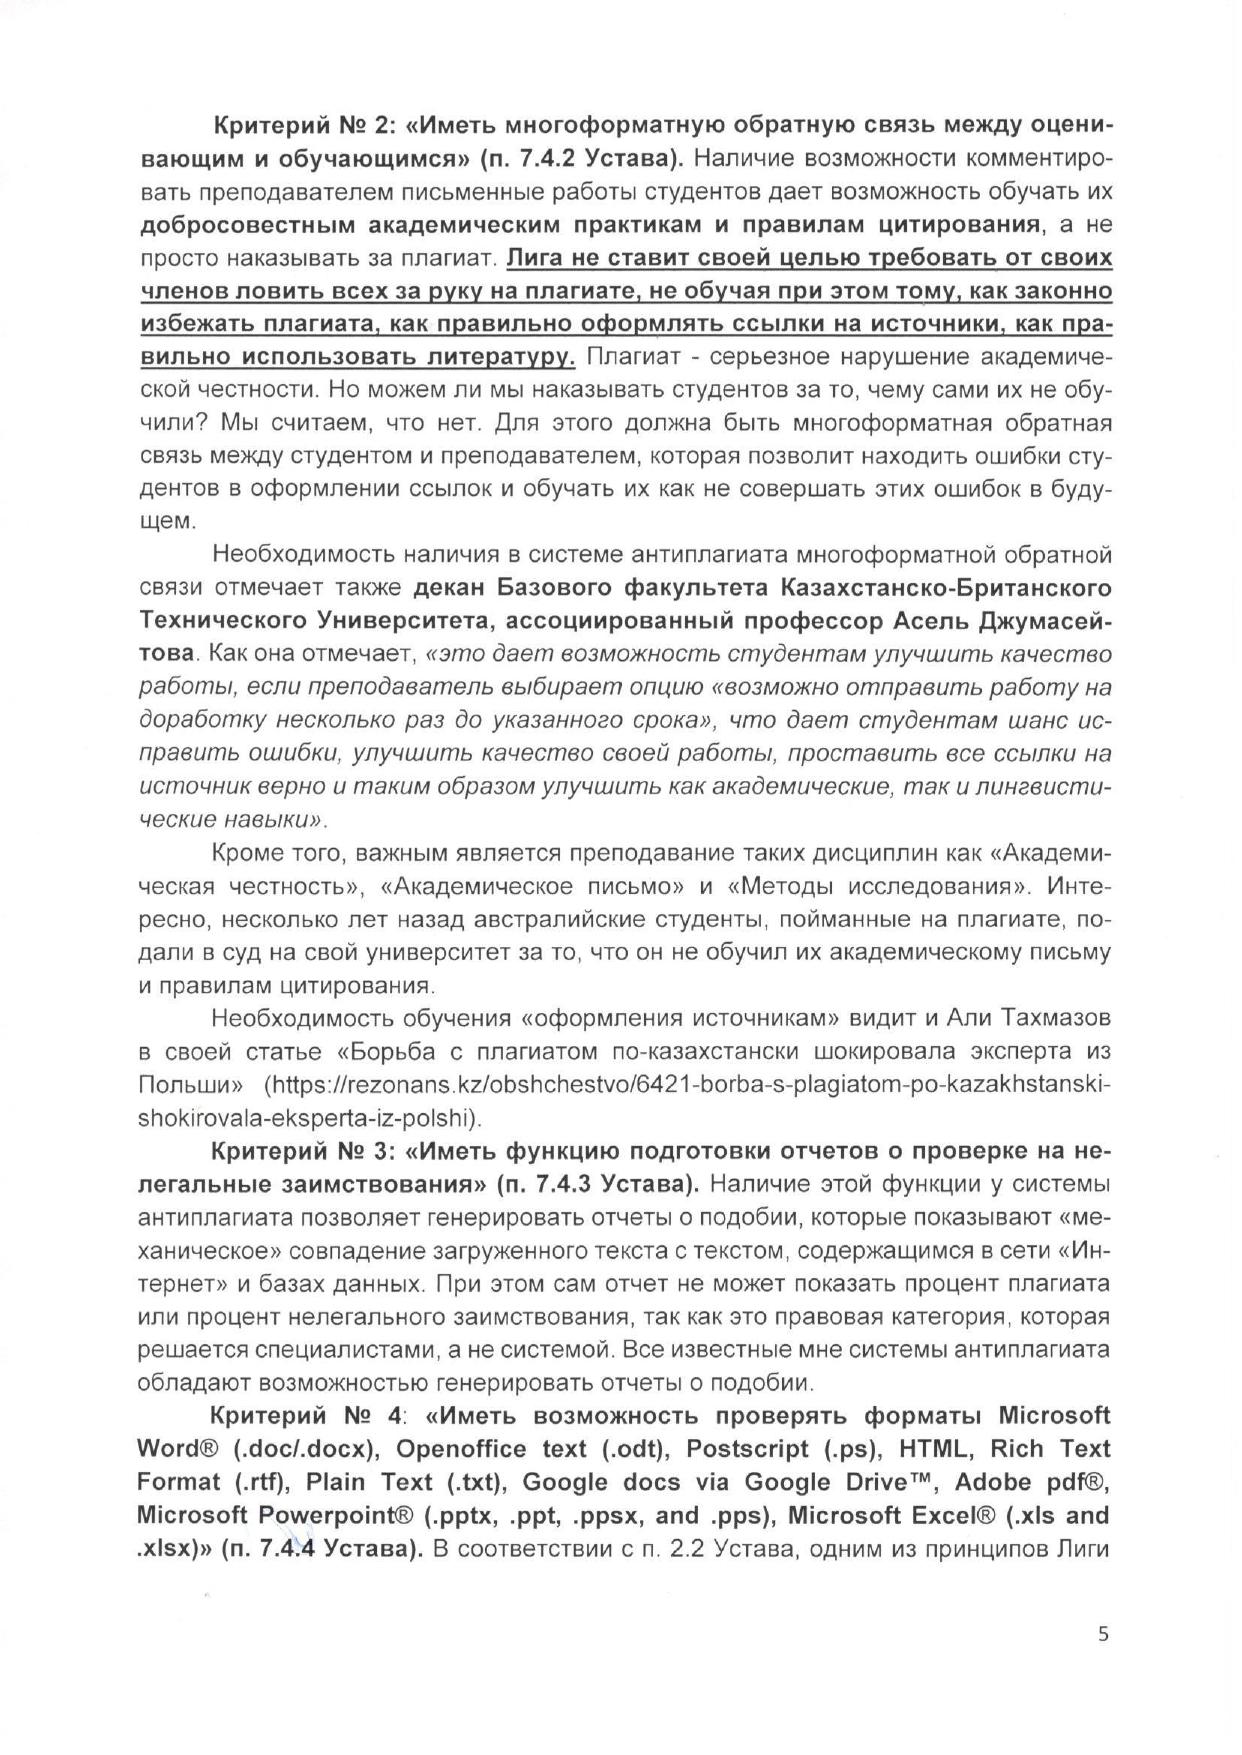 https://inbusiness.kz/ru/images/original/25/images/3m5yMF3E.jpg